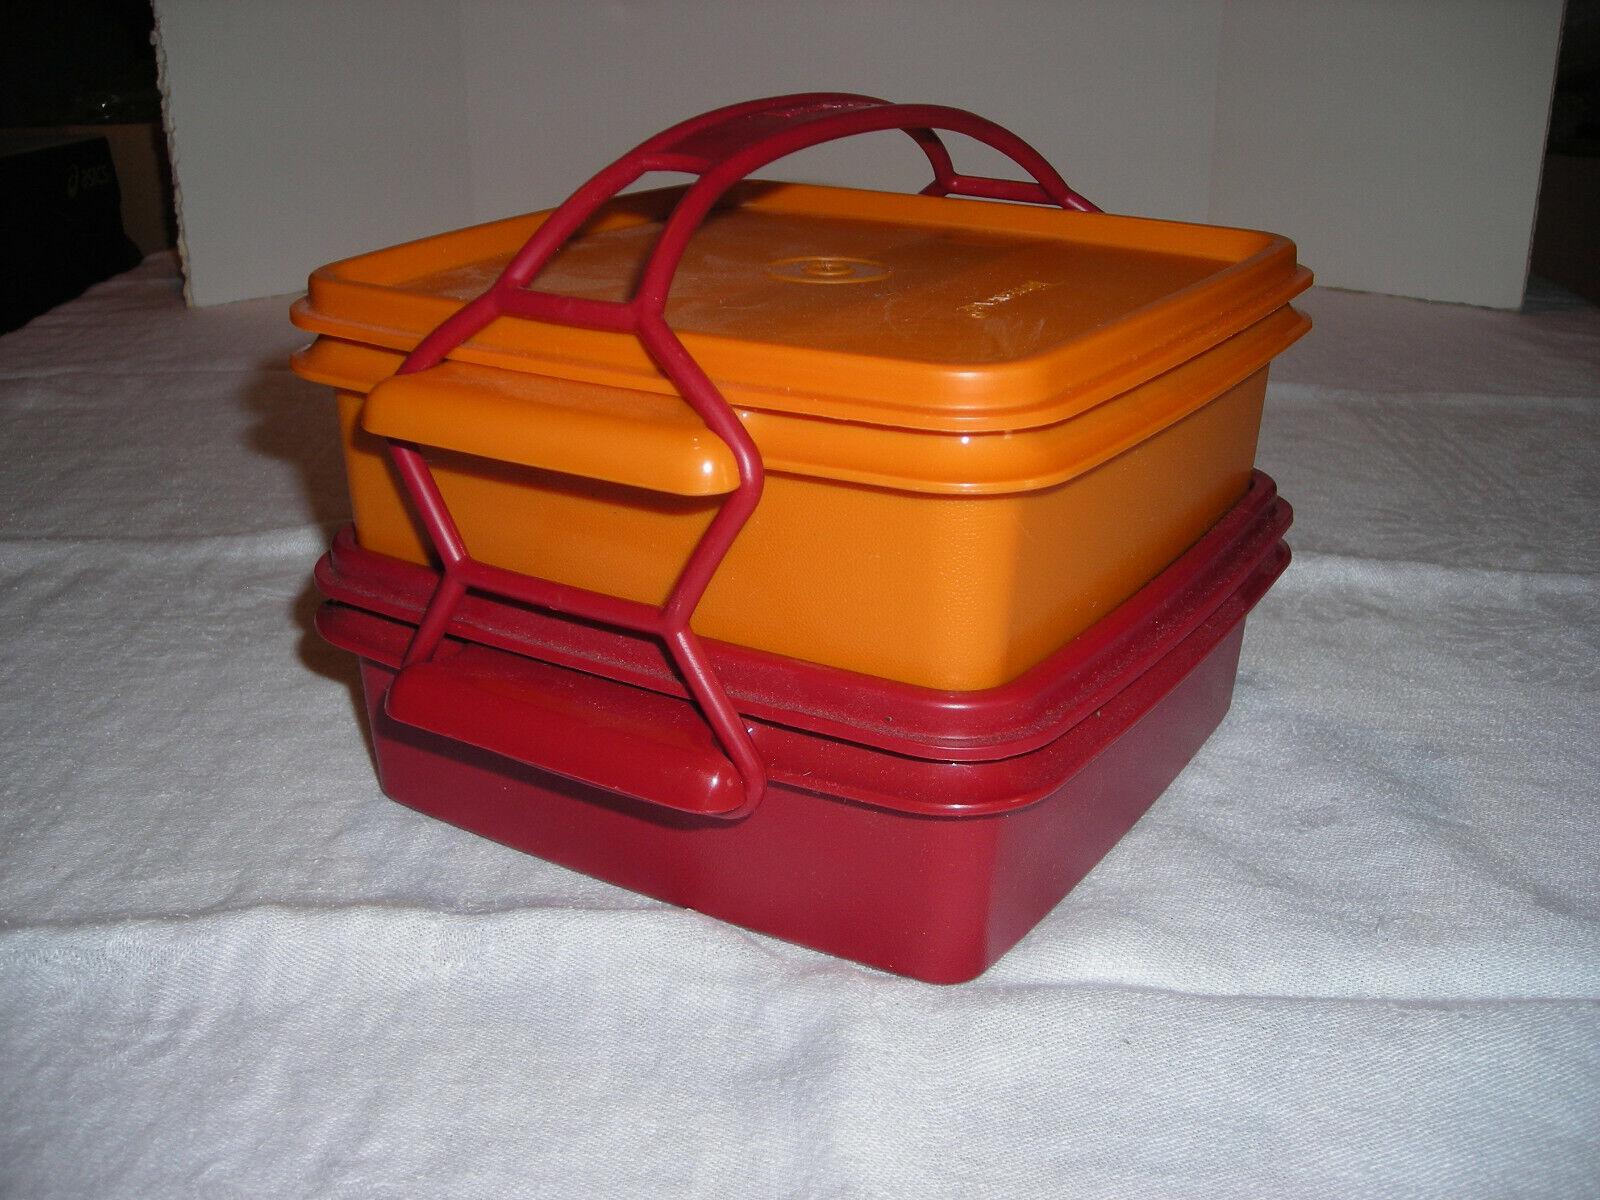 Tupperware 5-pc Quartet Containers Set -Lunch/Picnic #1362/1